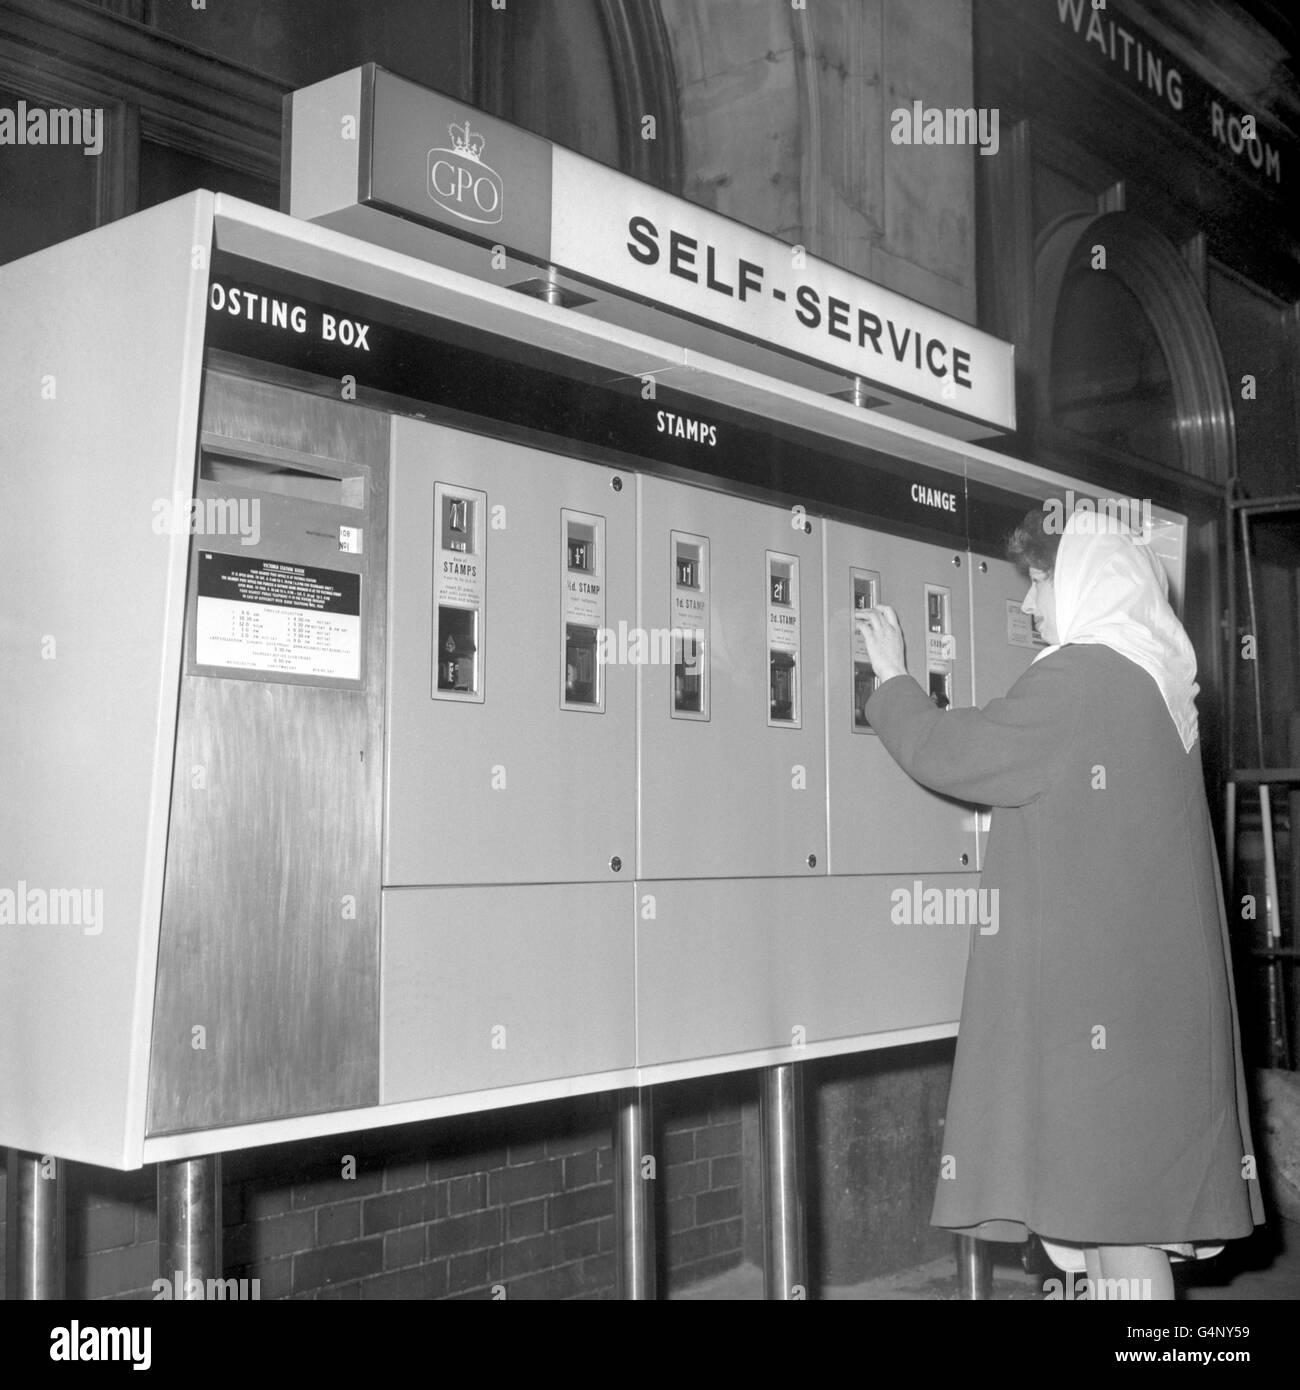 British Postal Service - Post Office Self-Service Kiosk - Victoria Station, London - Stock Image